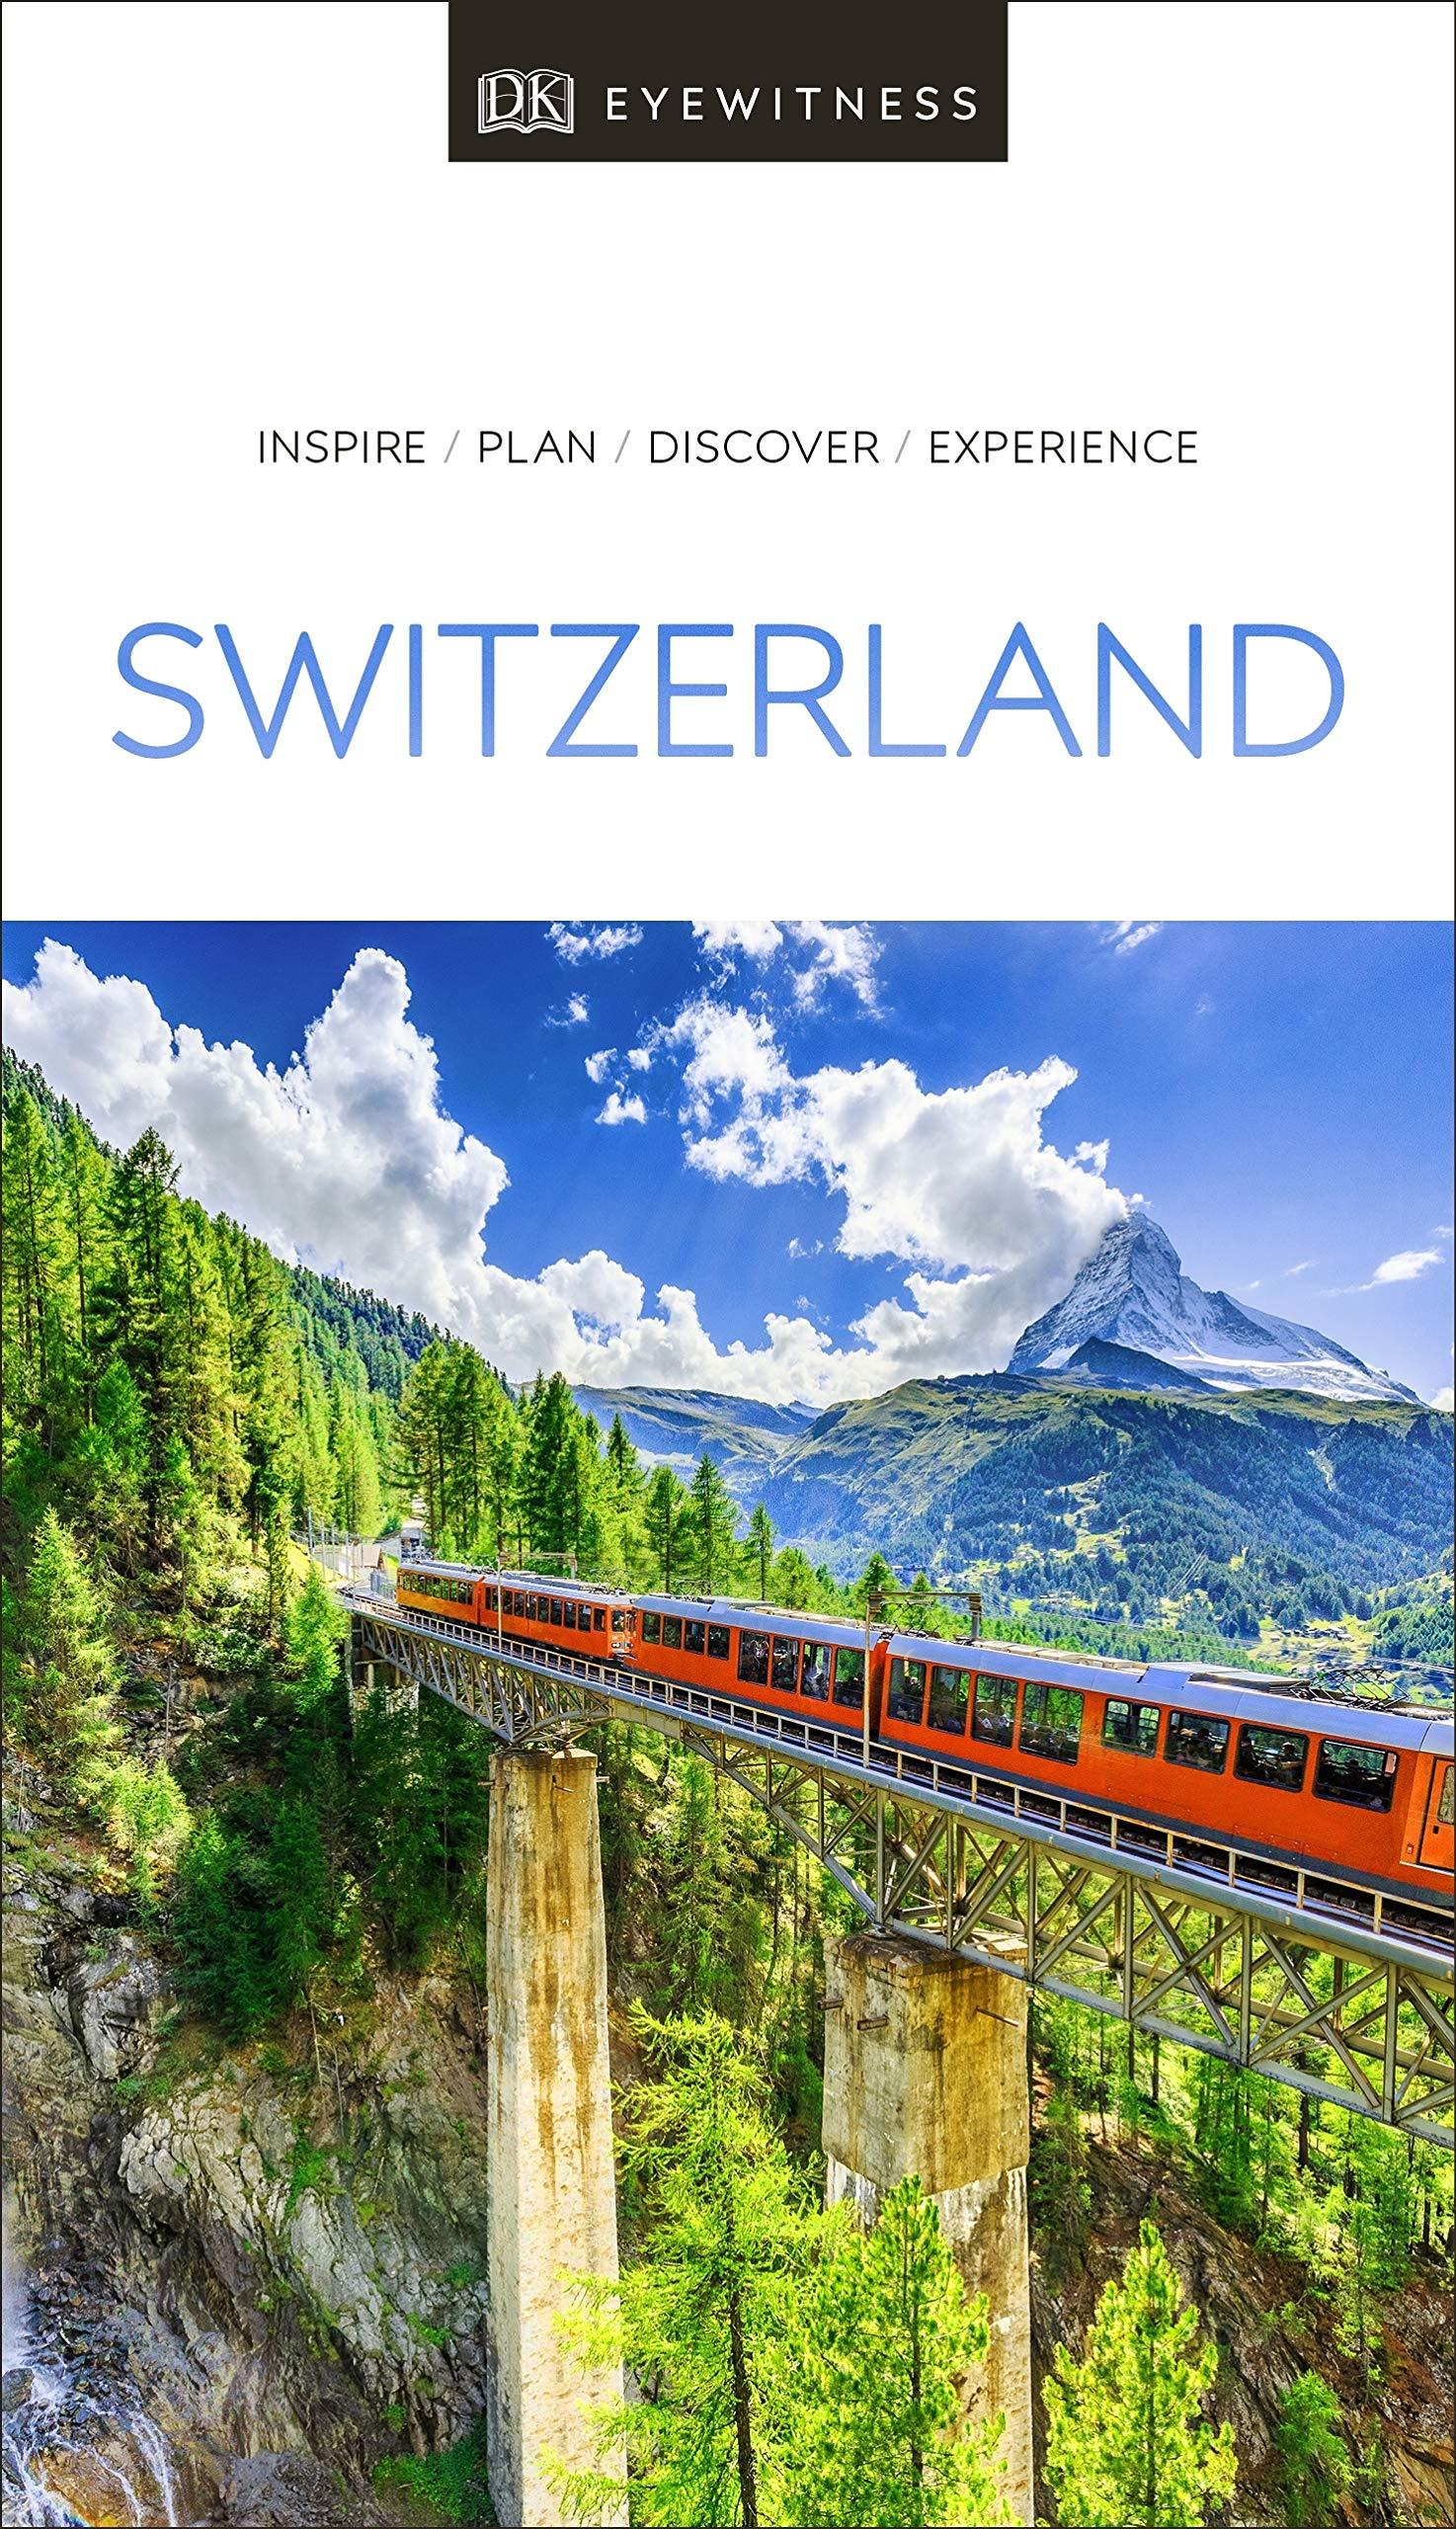 DK Eyewitness Travel Guide Switzerland by DK Eyewitness Travel